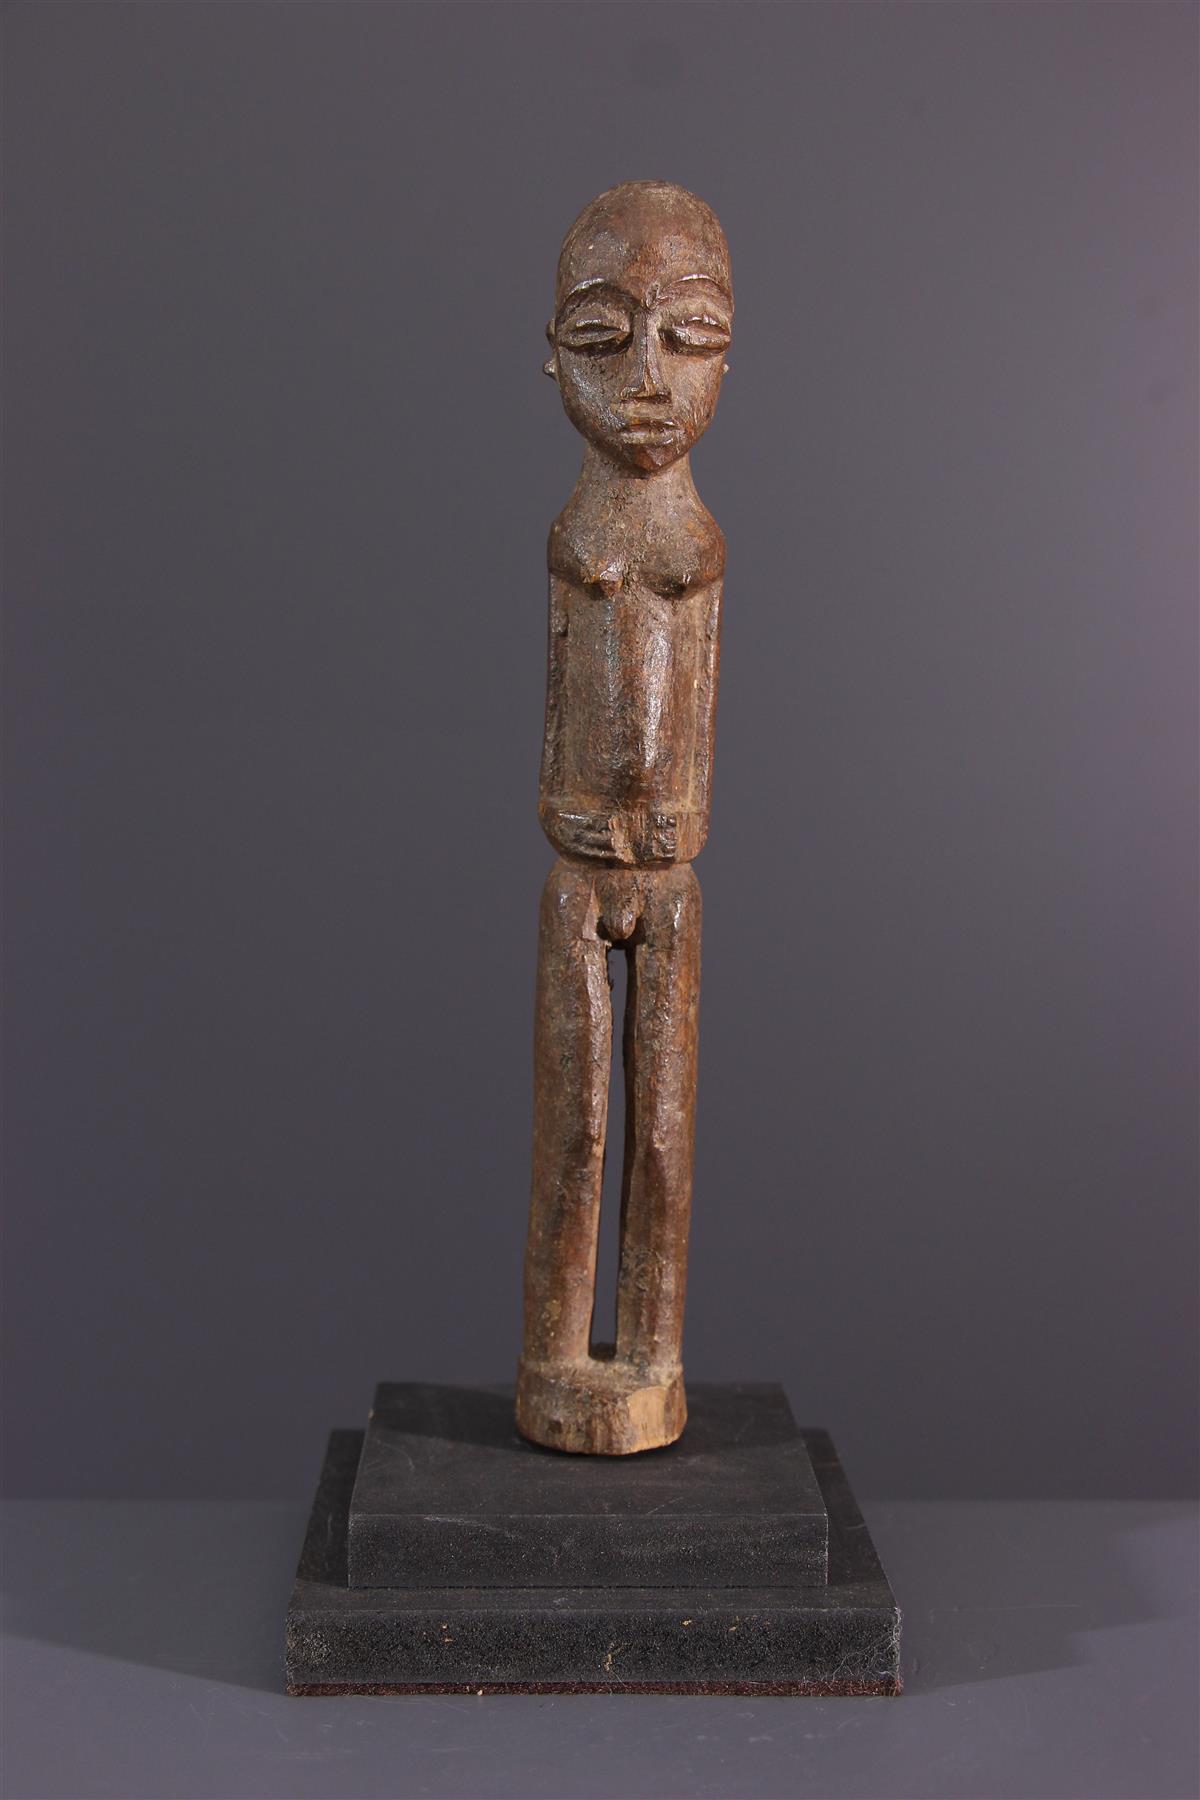 Lobe figurines - Tribal art